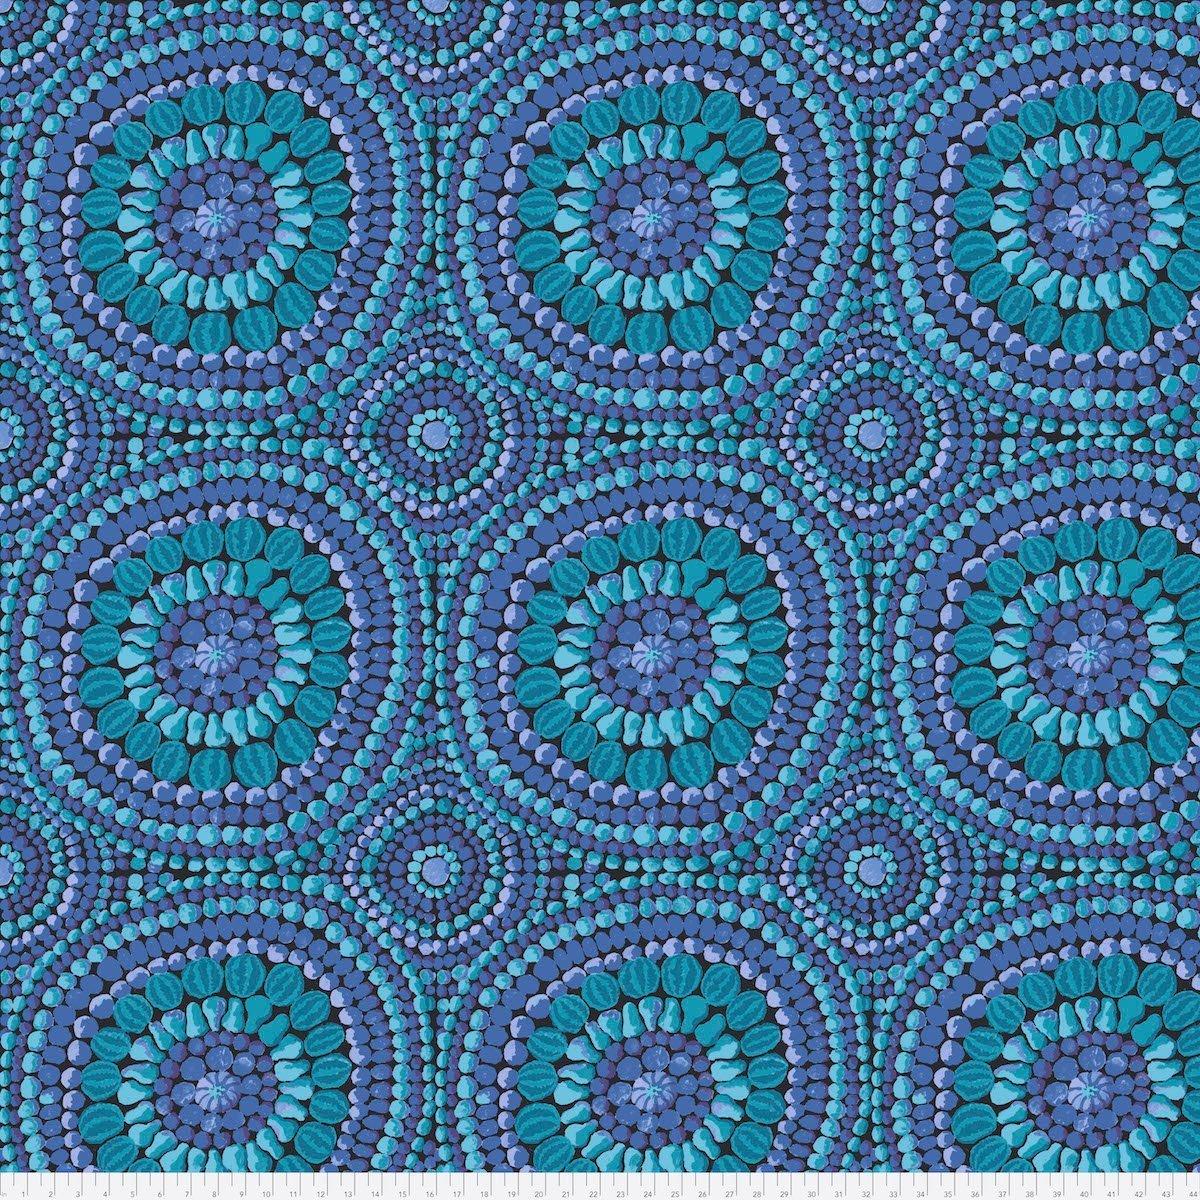 Free Spirit Kaffe Fassett Fall 2018 Mandala Blue 108 QBGP003.BLUE